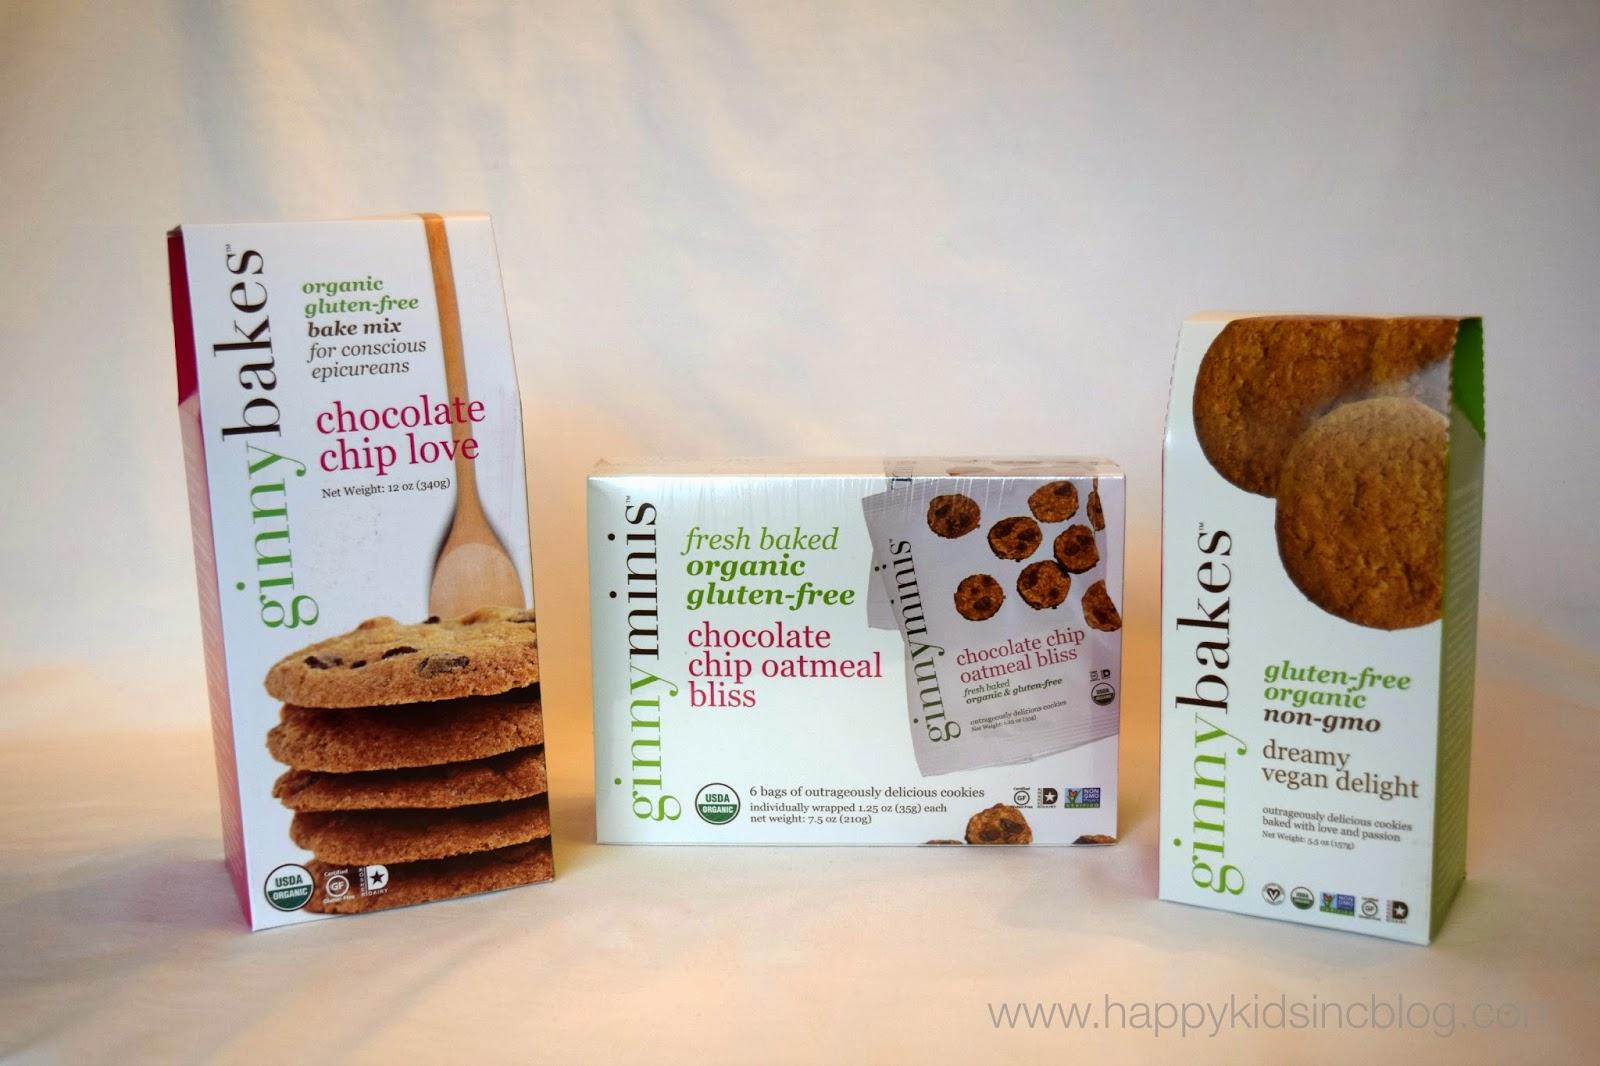 ginnybakes gluten free cookies and bake mixes